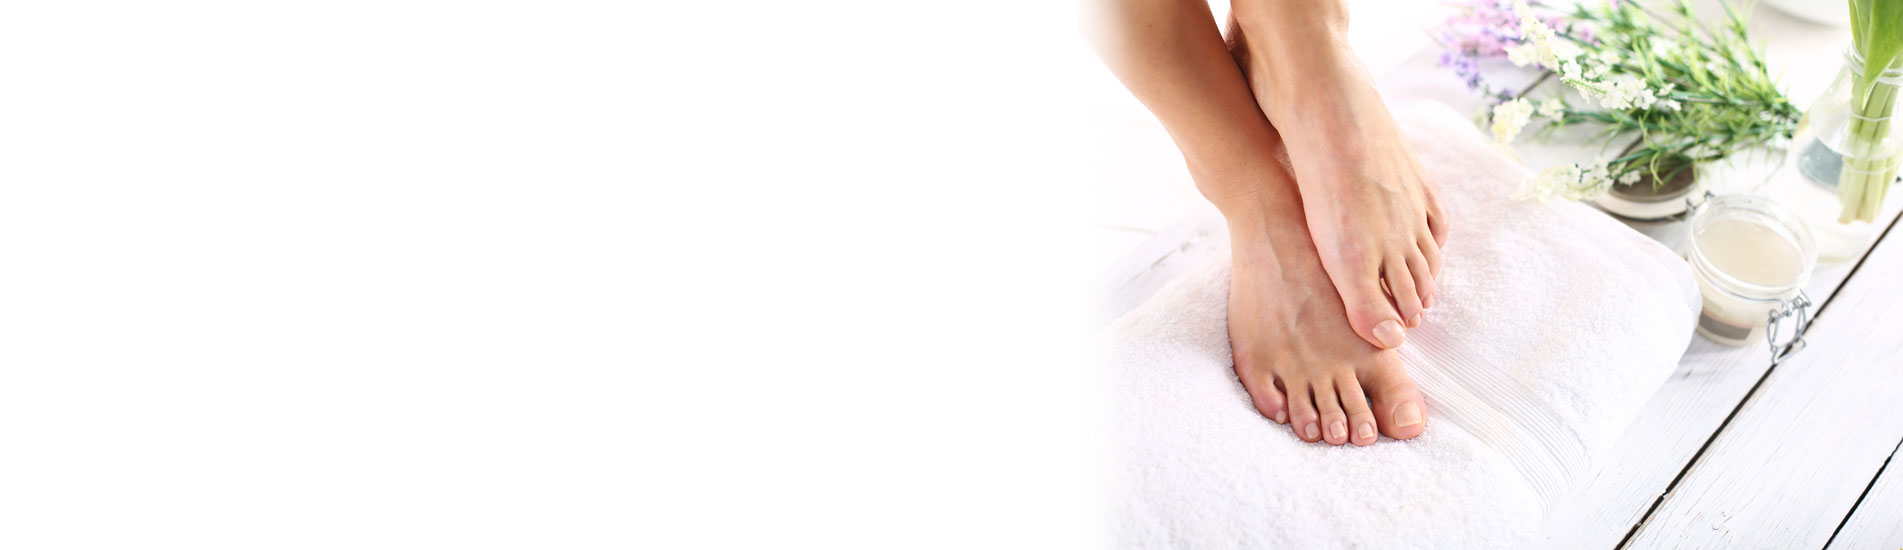 Hautarztpraxis am Roseneck - medizinische Fußpflege